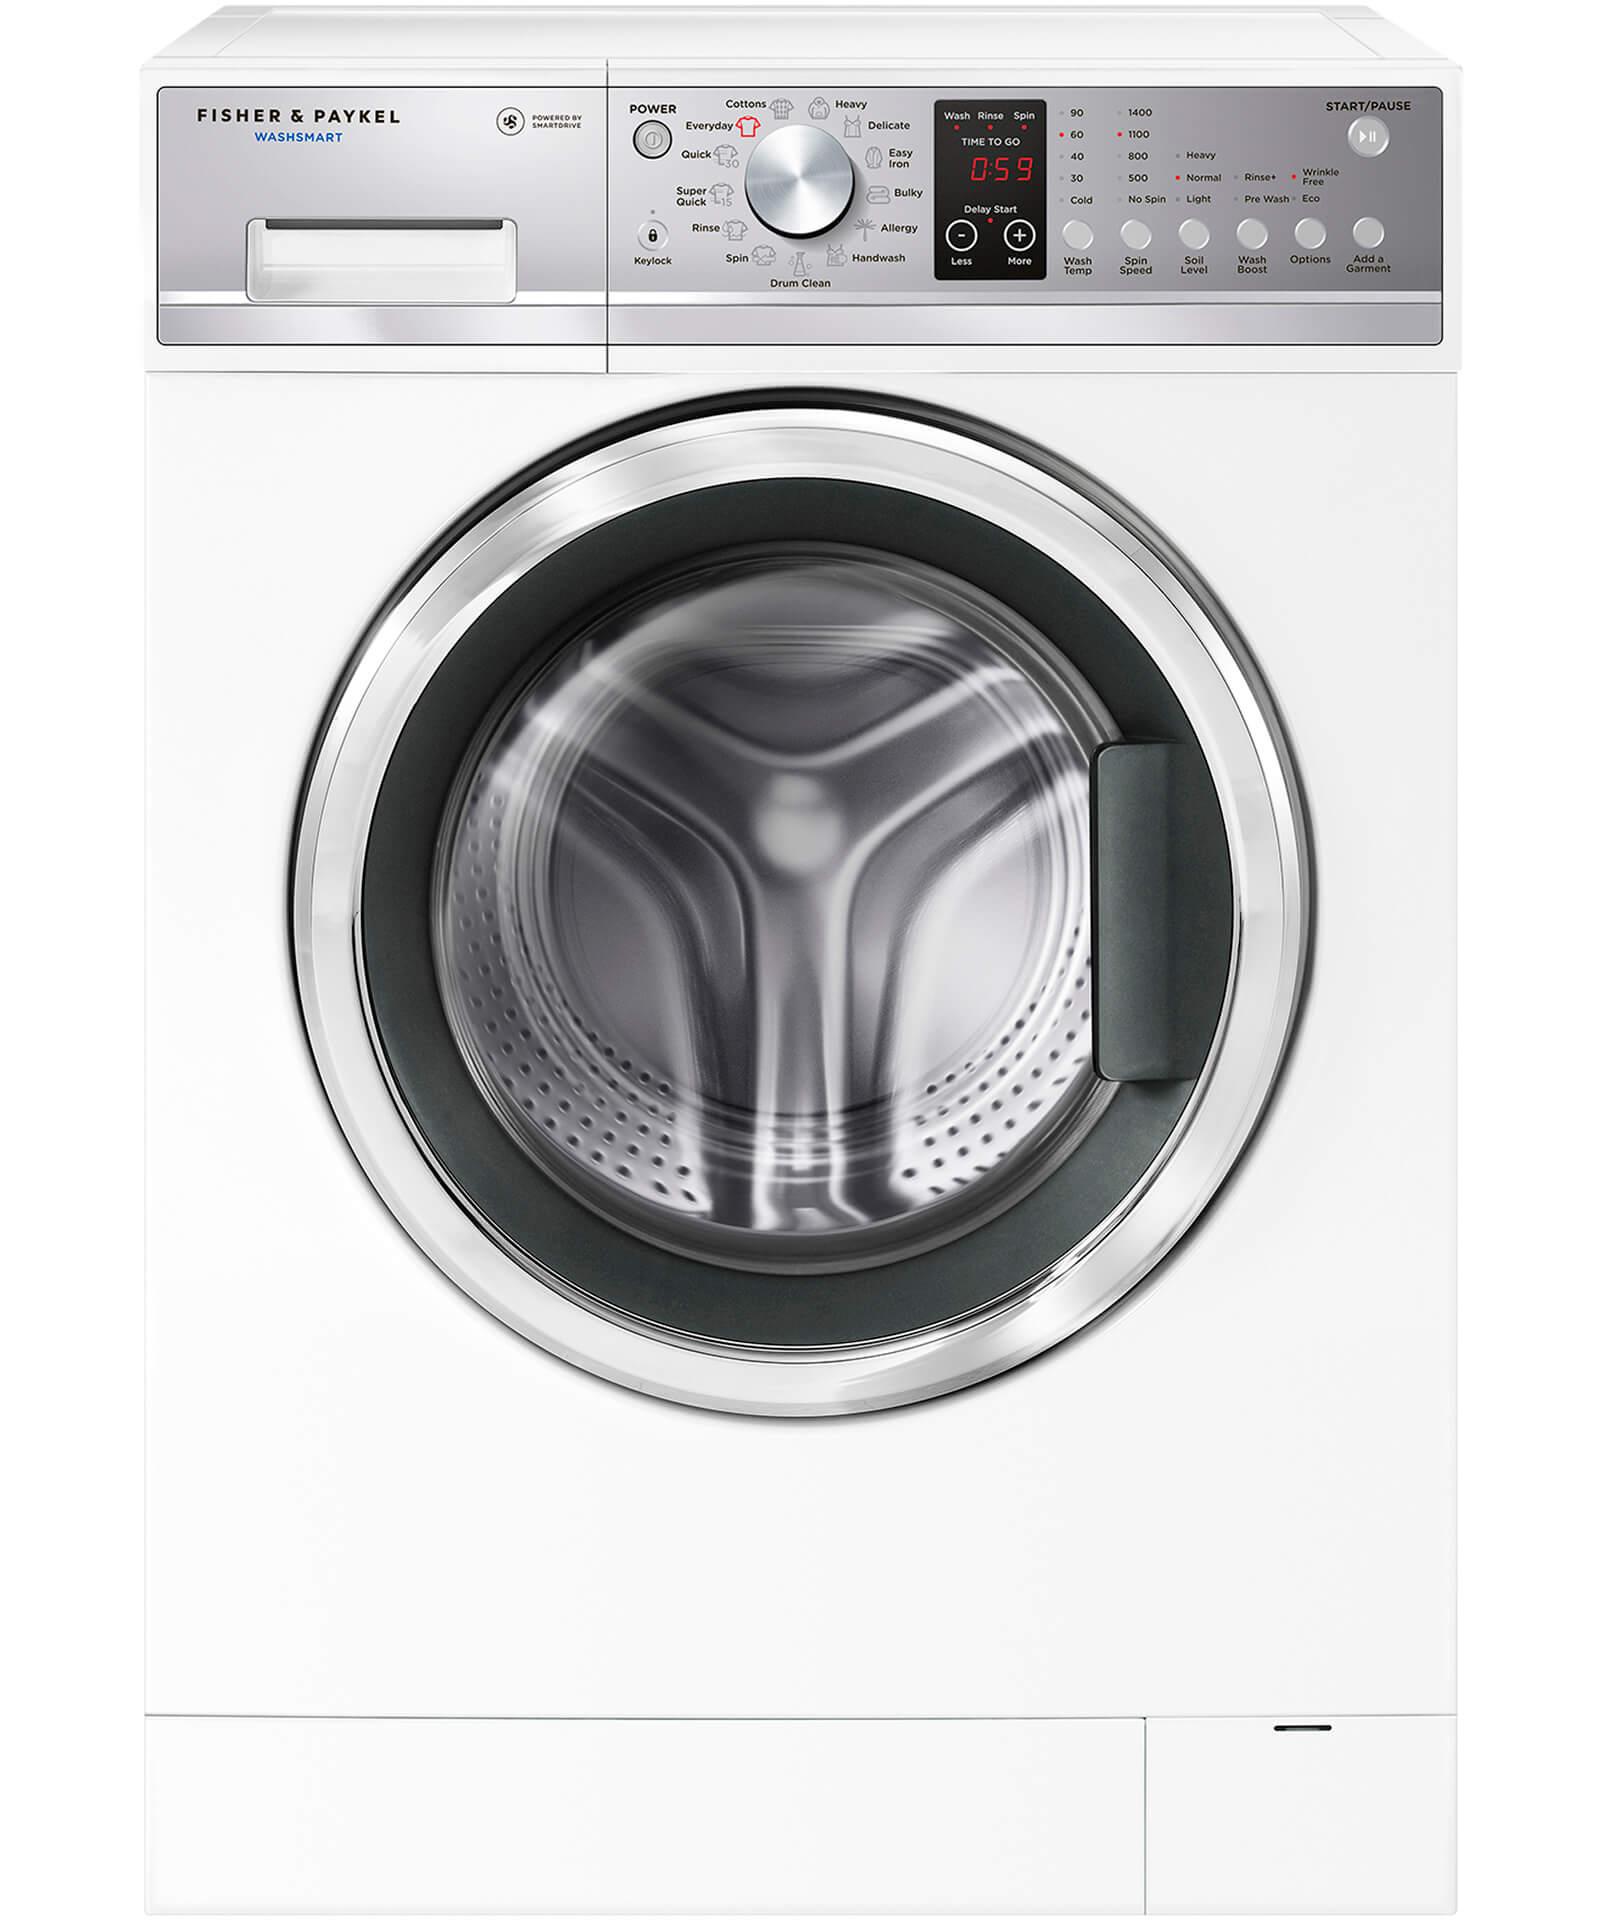 Wh7560p2 Front Loader Washing Machine 75kg Washsmart Fisher